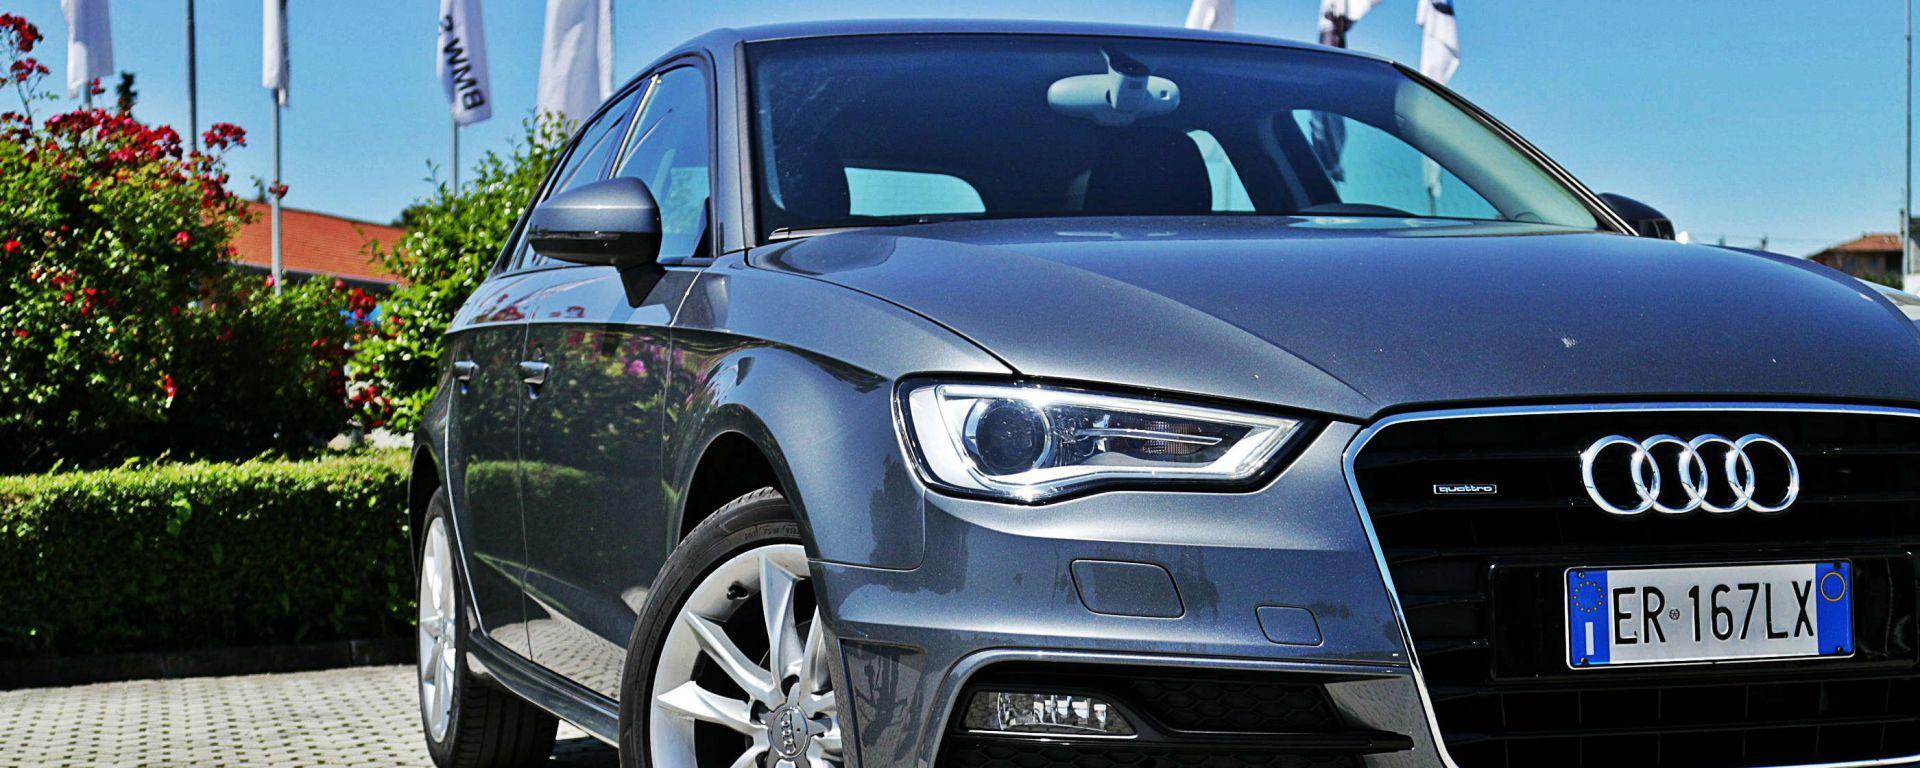 Audi A3 Sportback: Check-up usato [Video]